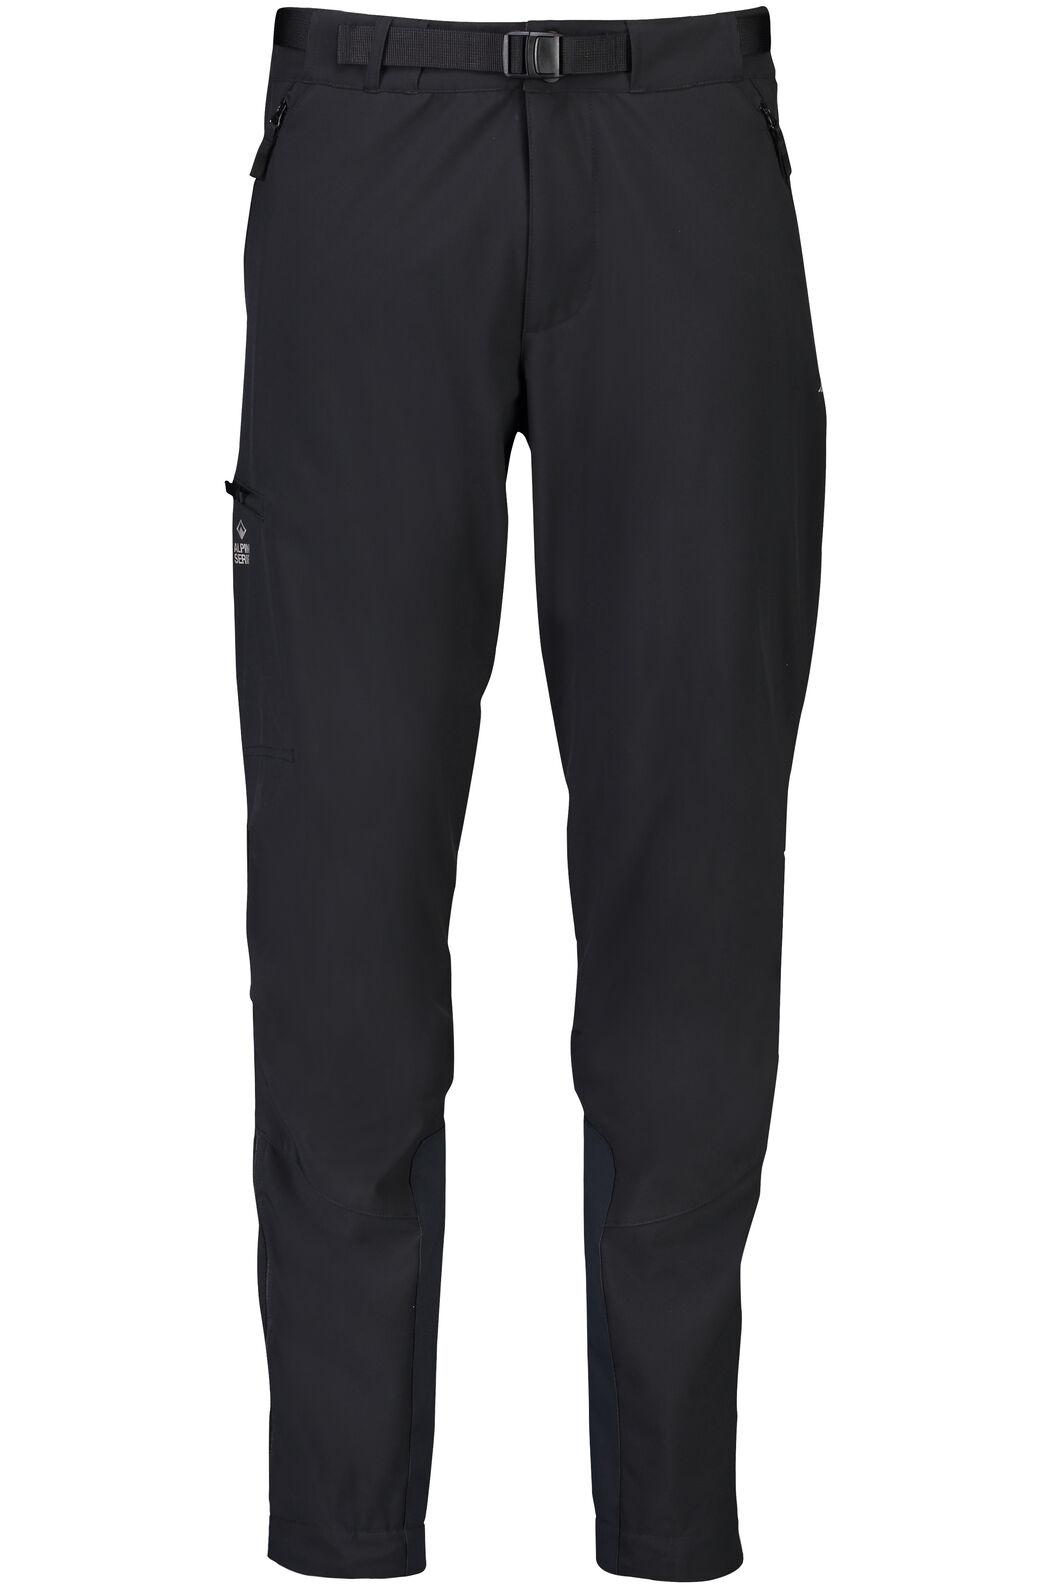 Fitzroy Alpine Series Softshell Pants - Men's, Black, hi-res